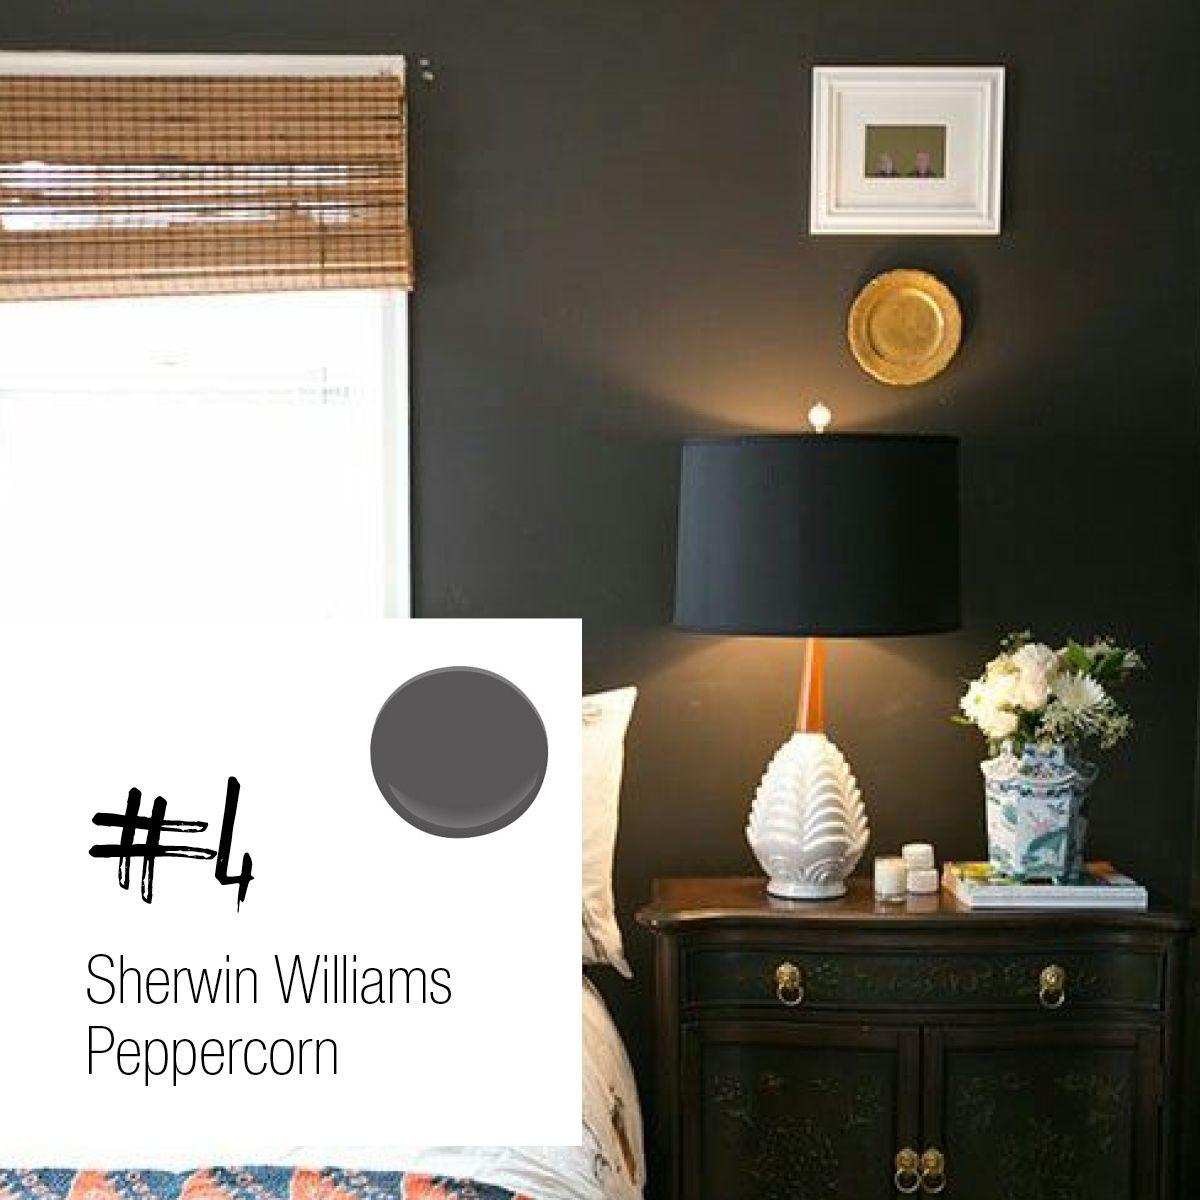 Sherwin williams peppercorn peppercorn sherwin williams sherwin williams gray exterior trim house paint